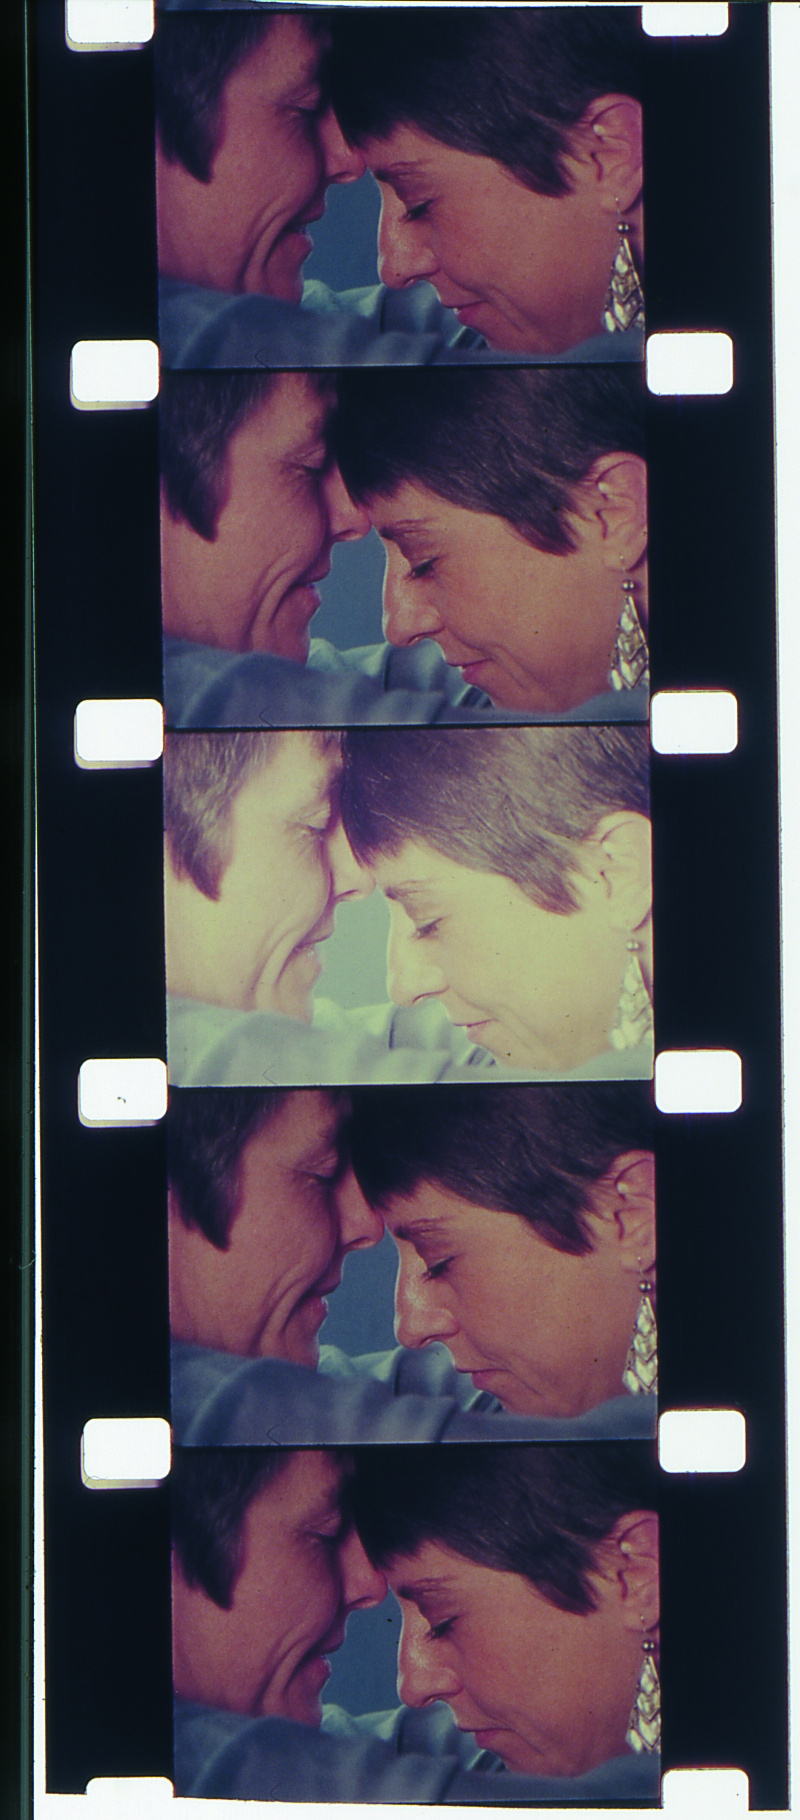 Barbara Hammer, Sync Touch, 1981